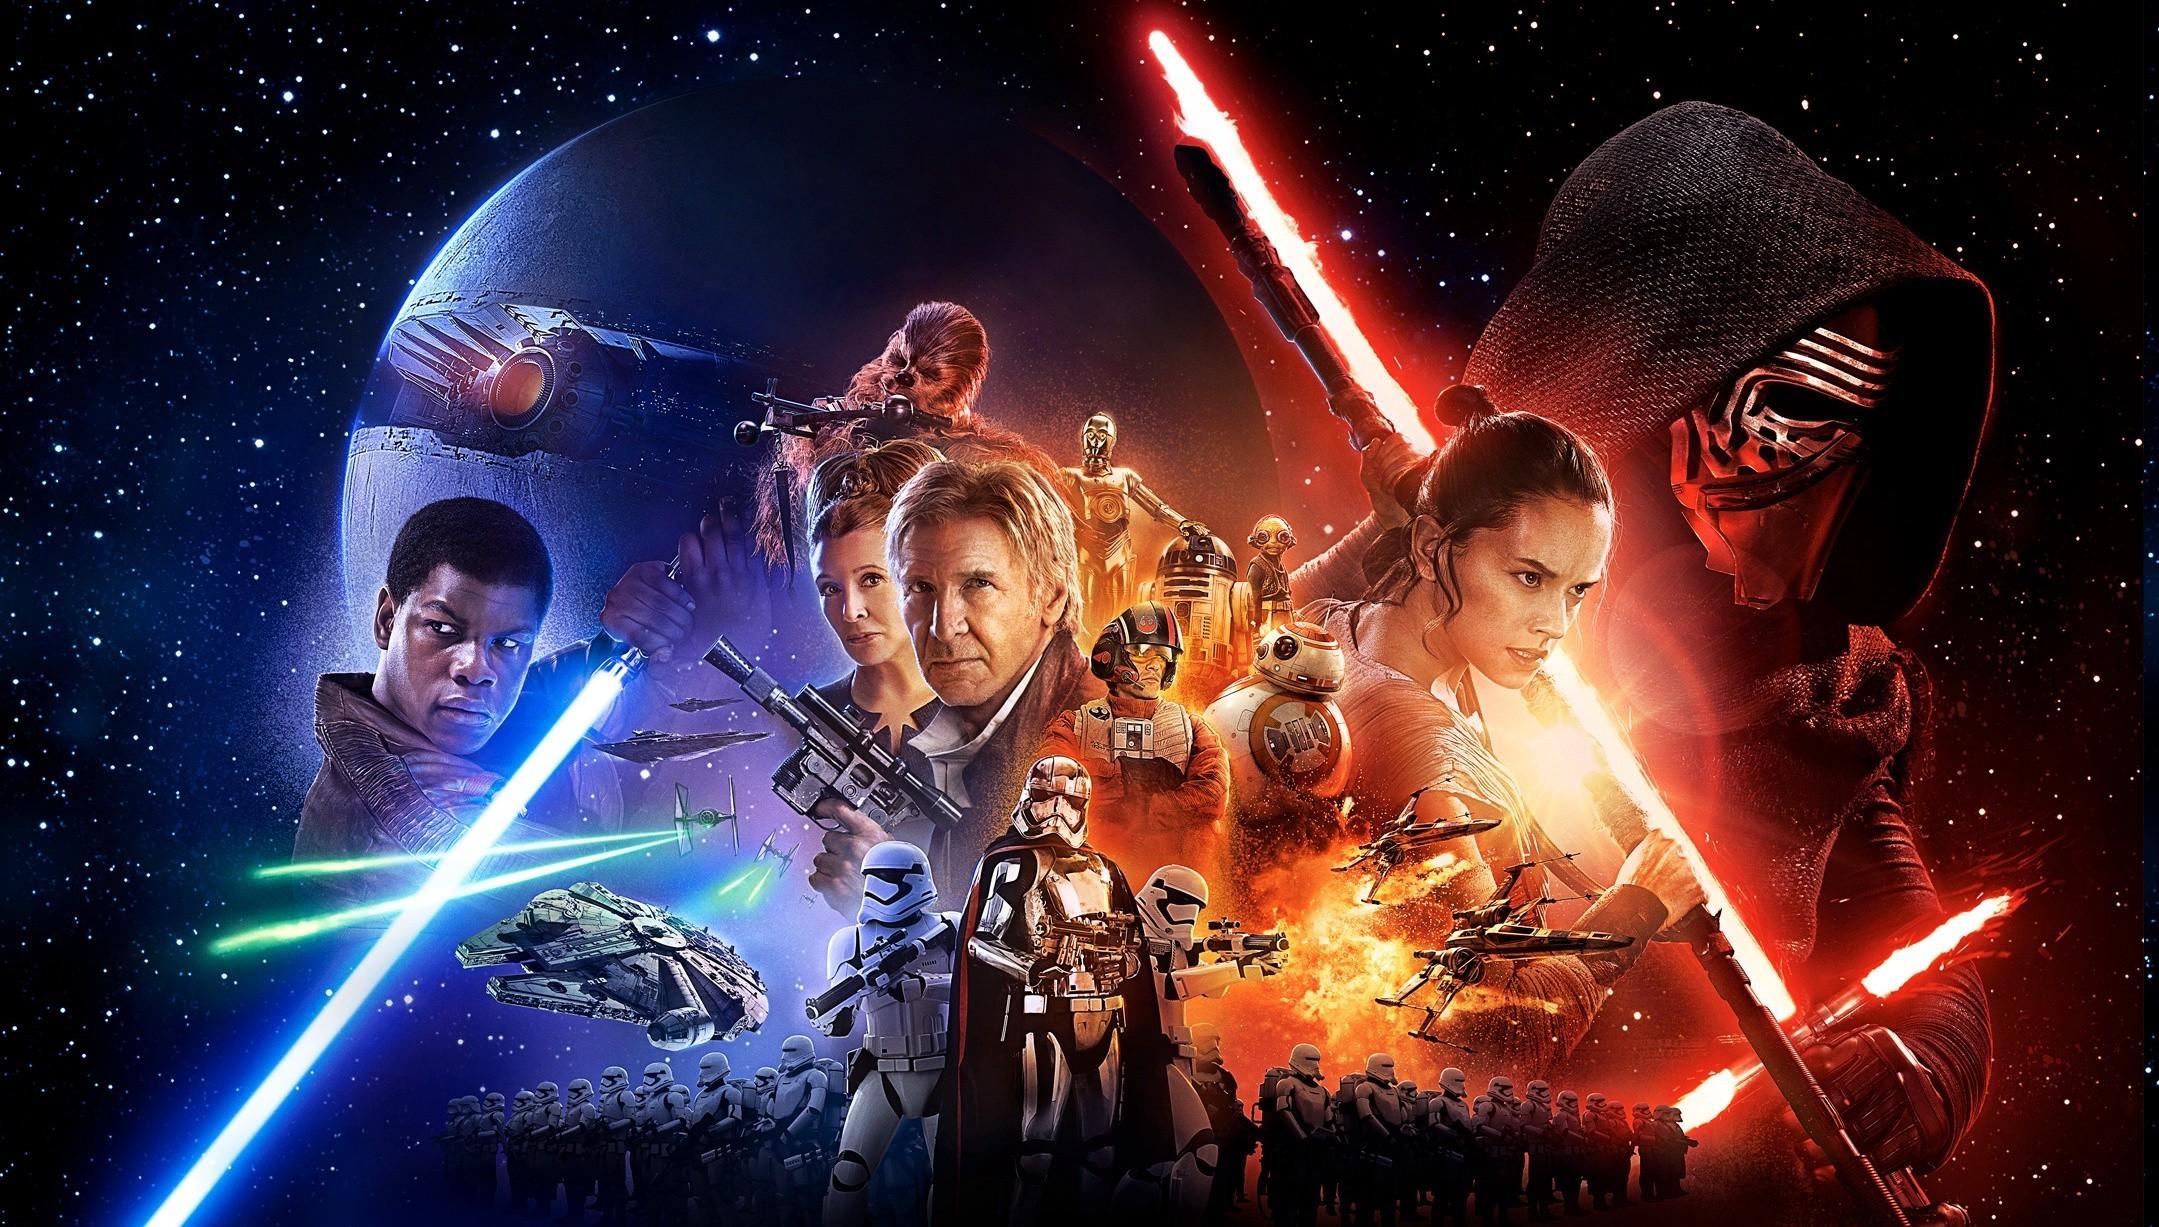 Star Wars 9 Wallpaper Hd , HD Wallpaper & Backgrounds